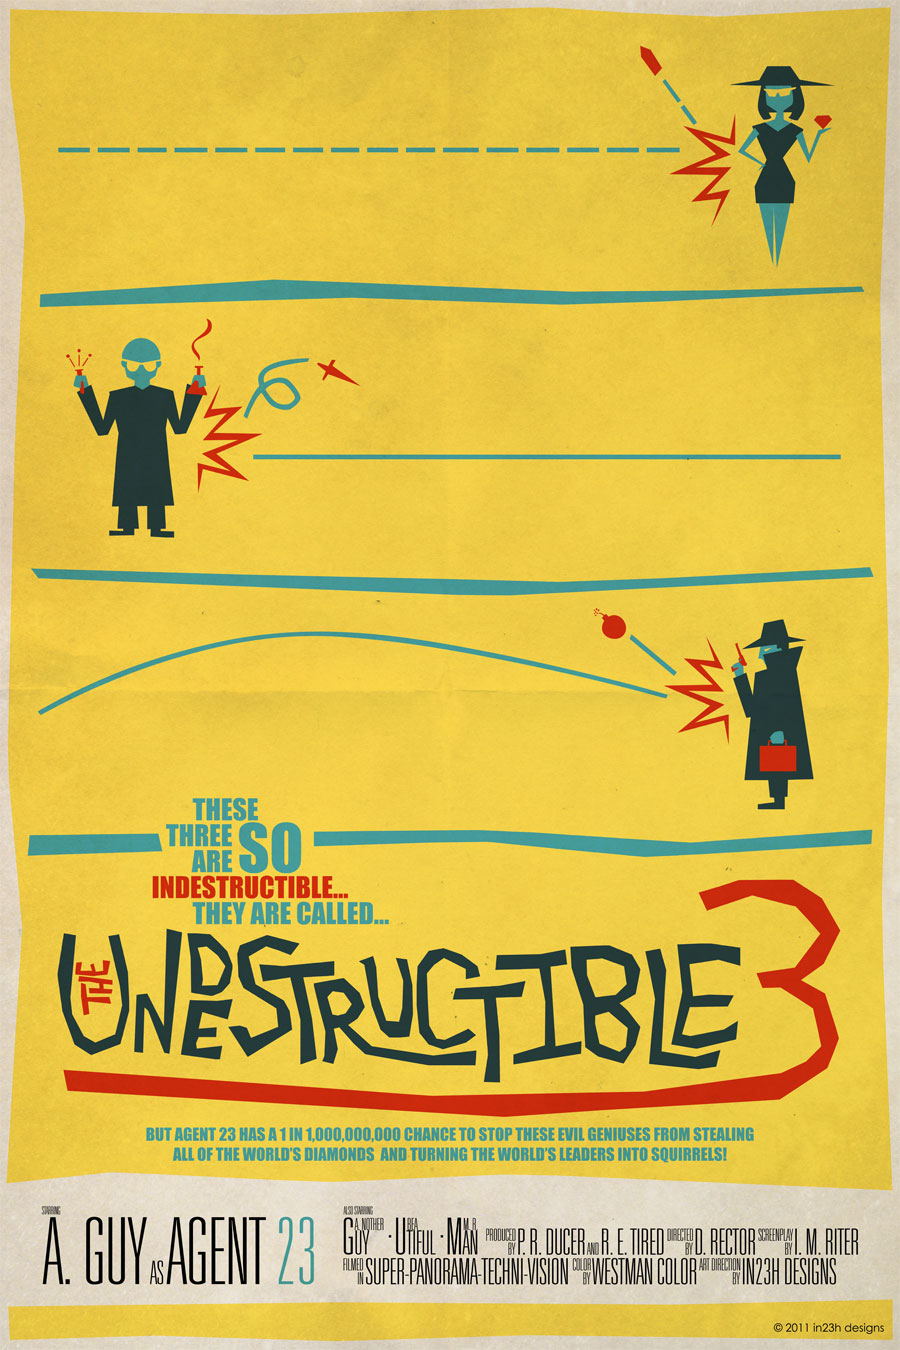 The Undestructible 3